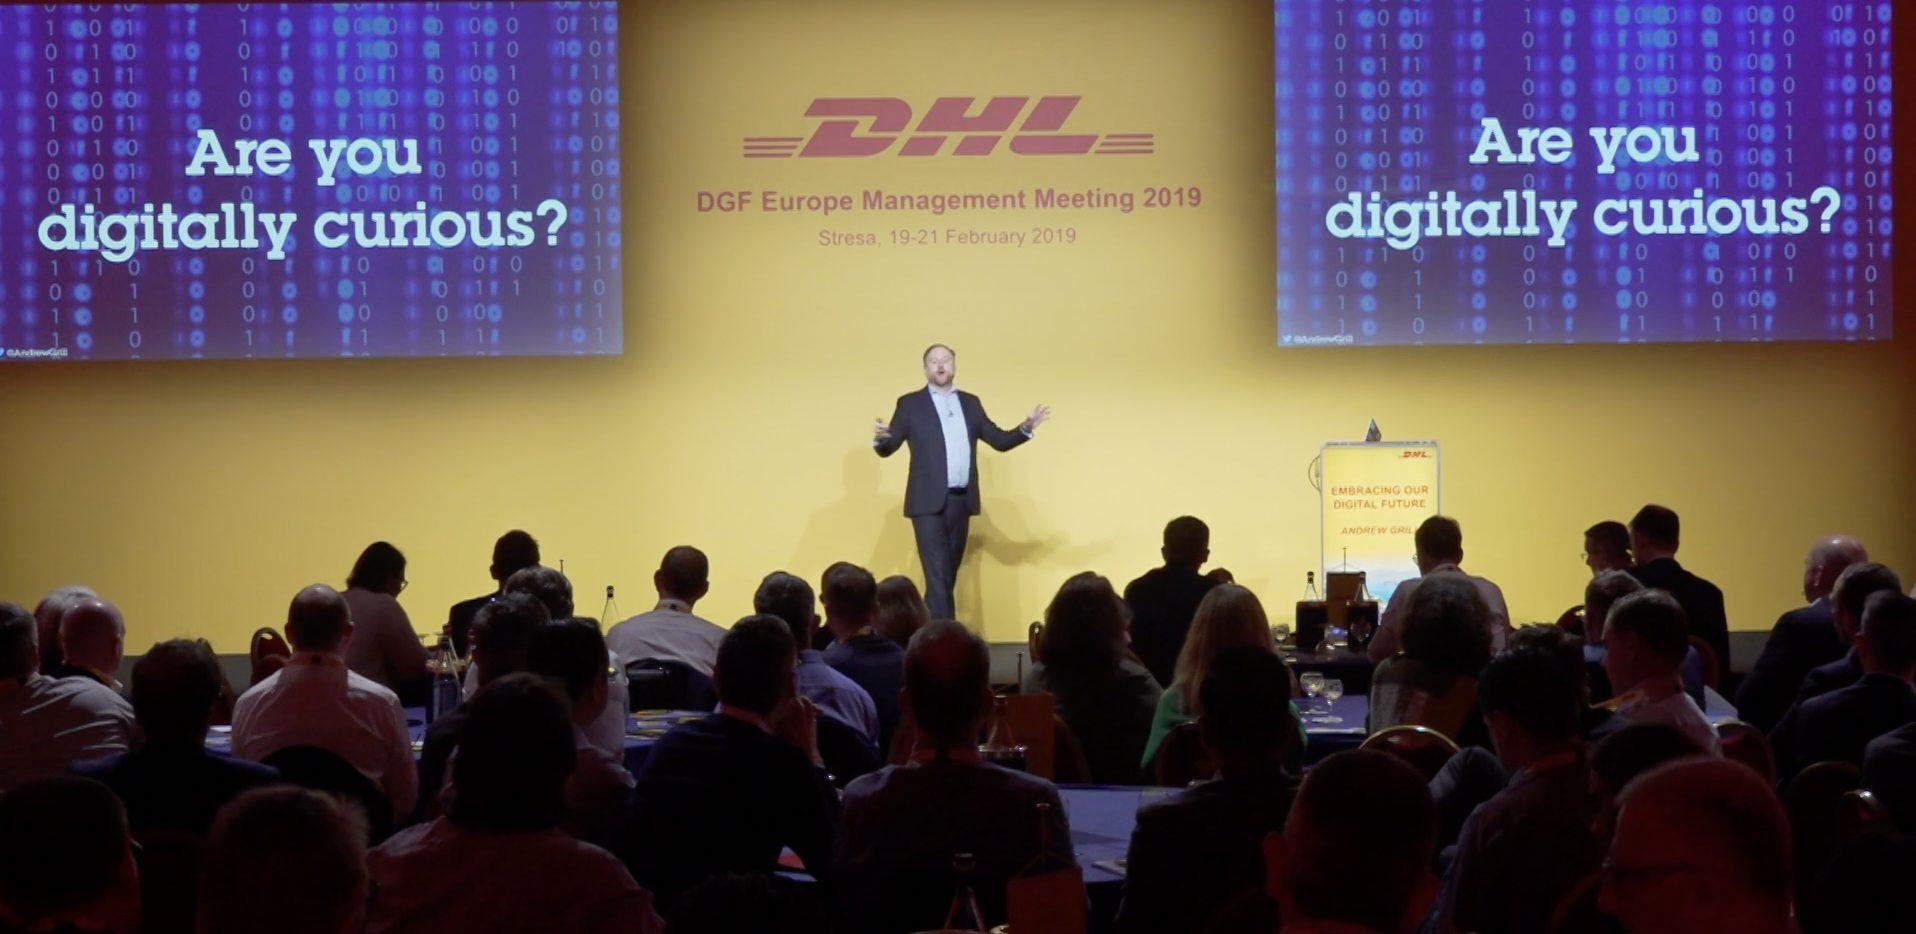 Our Digital Future – DHL Global Forwarding